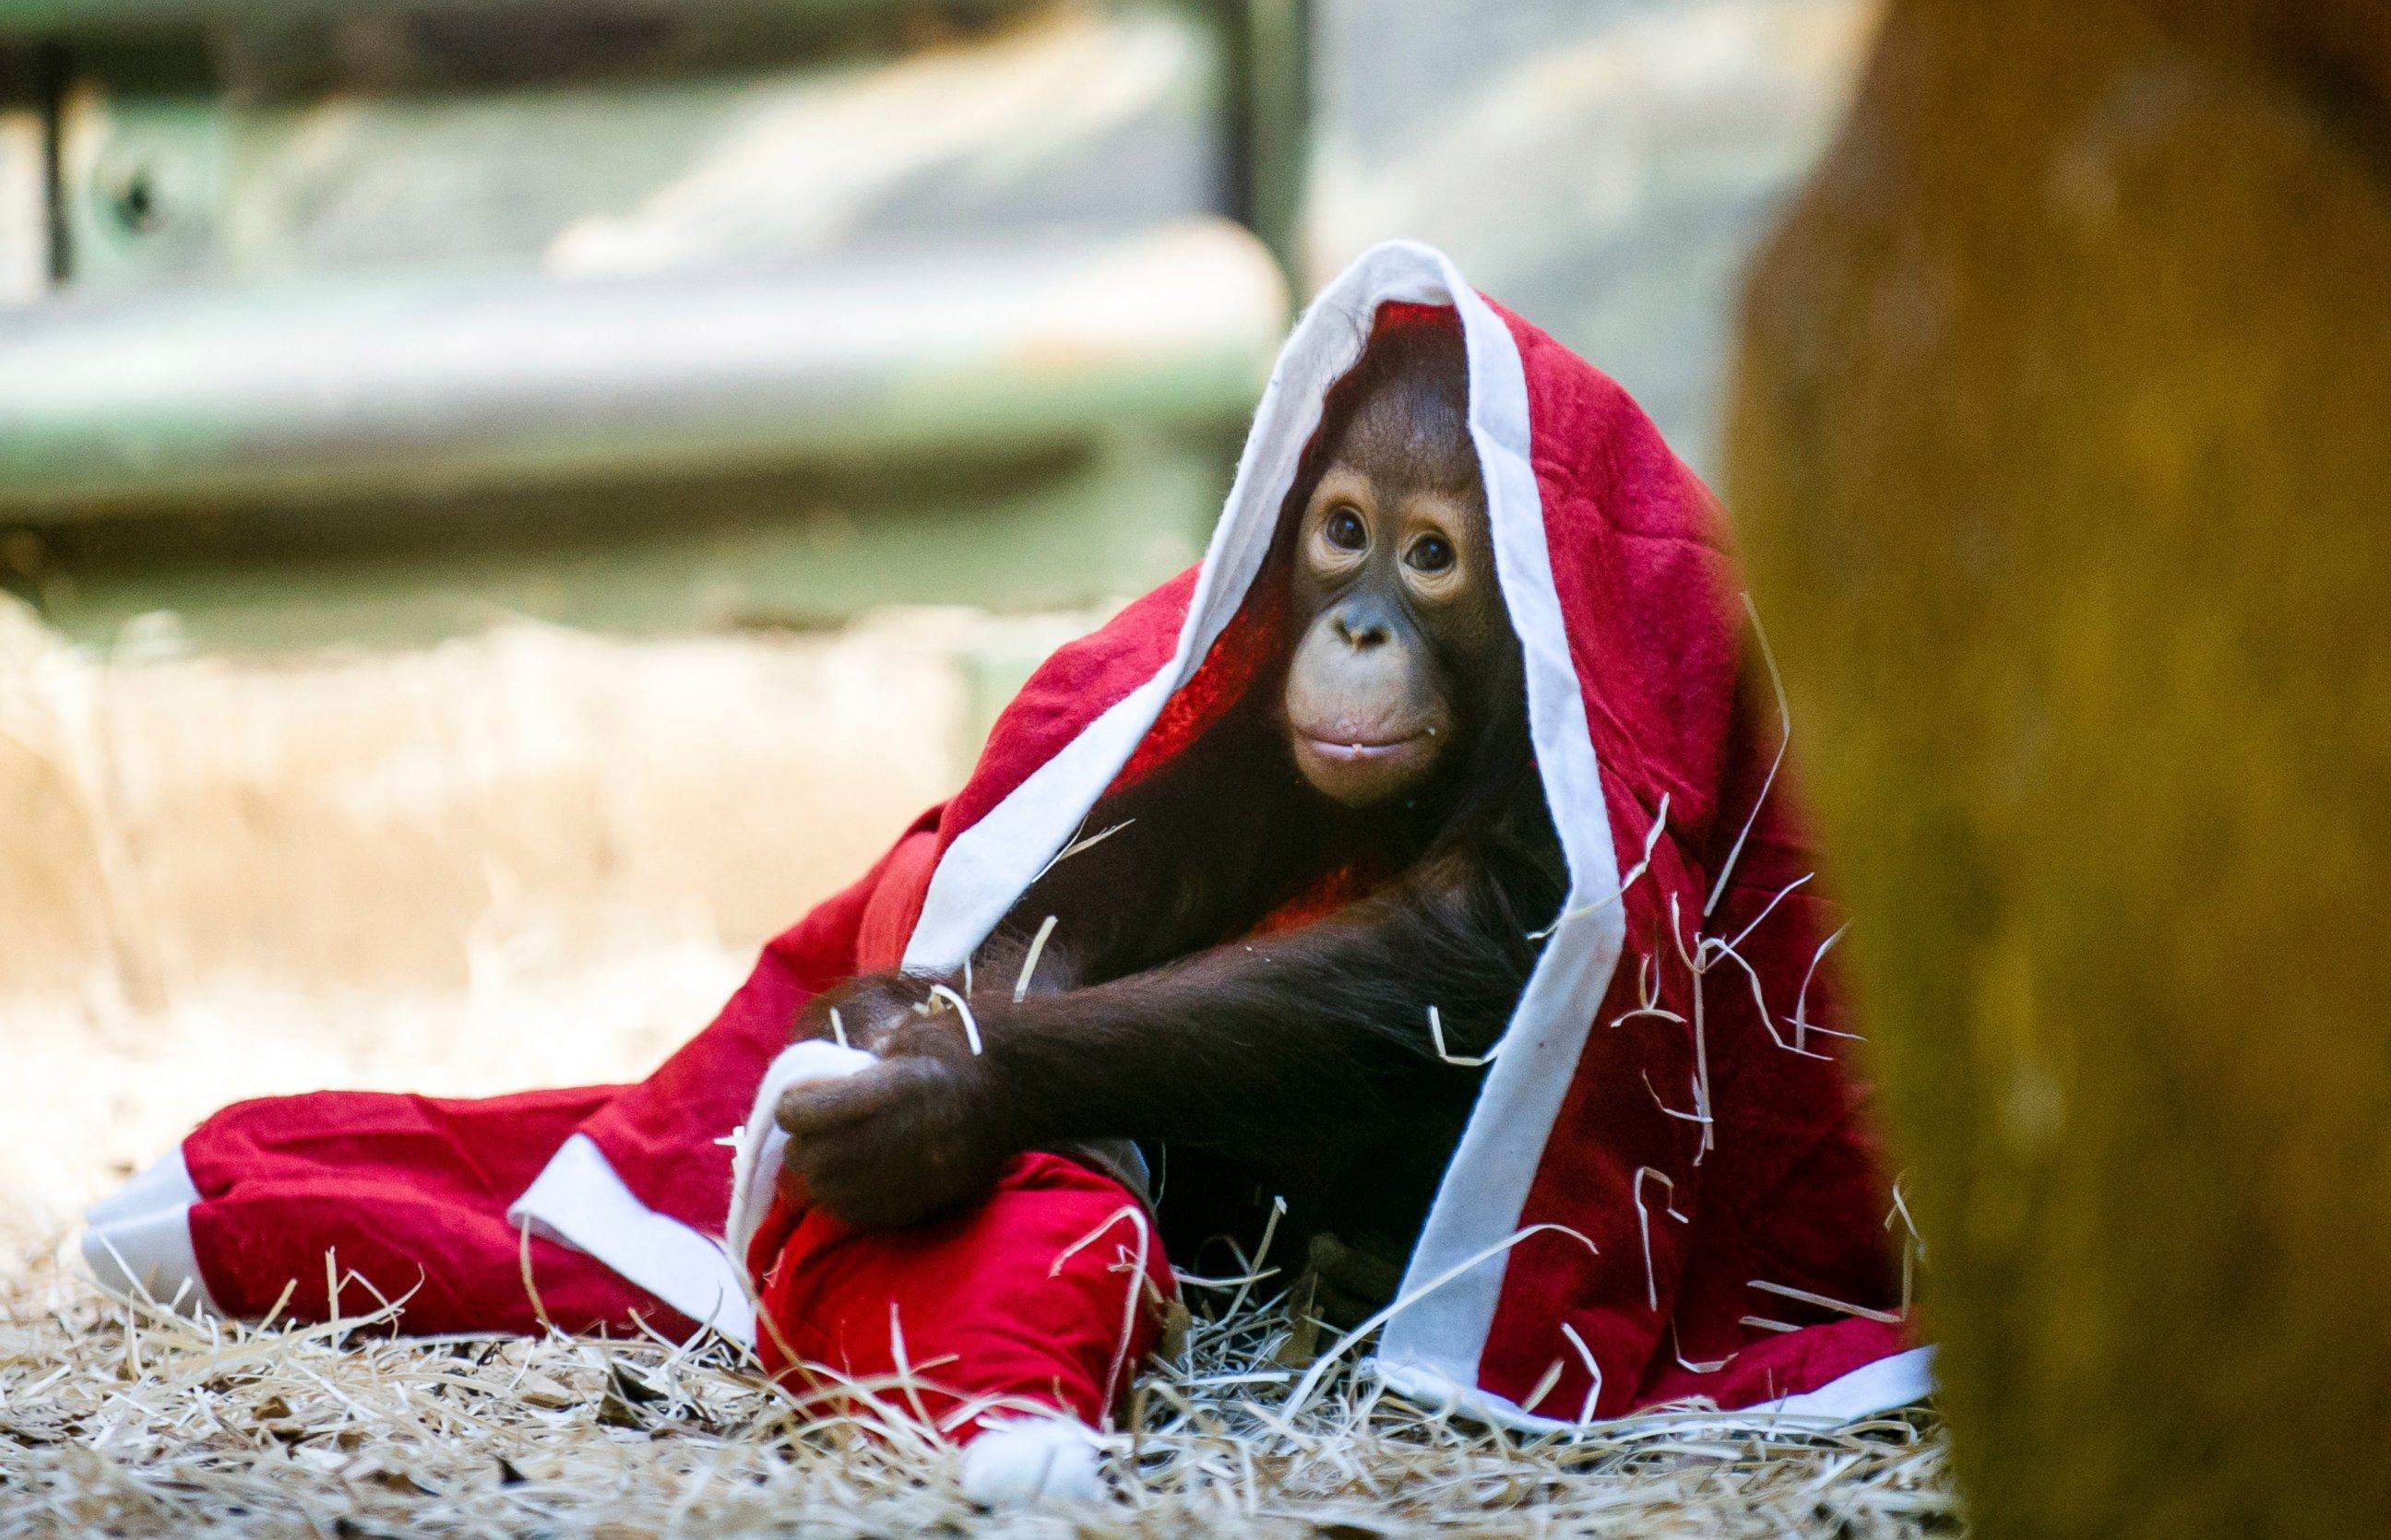 Baby Orangutan Goes Undercover to Ape St. Nick